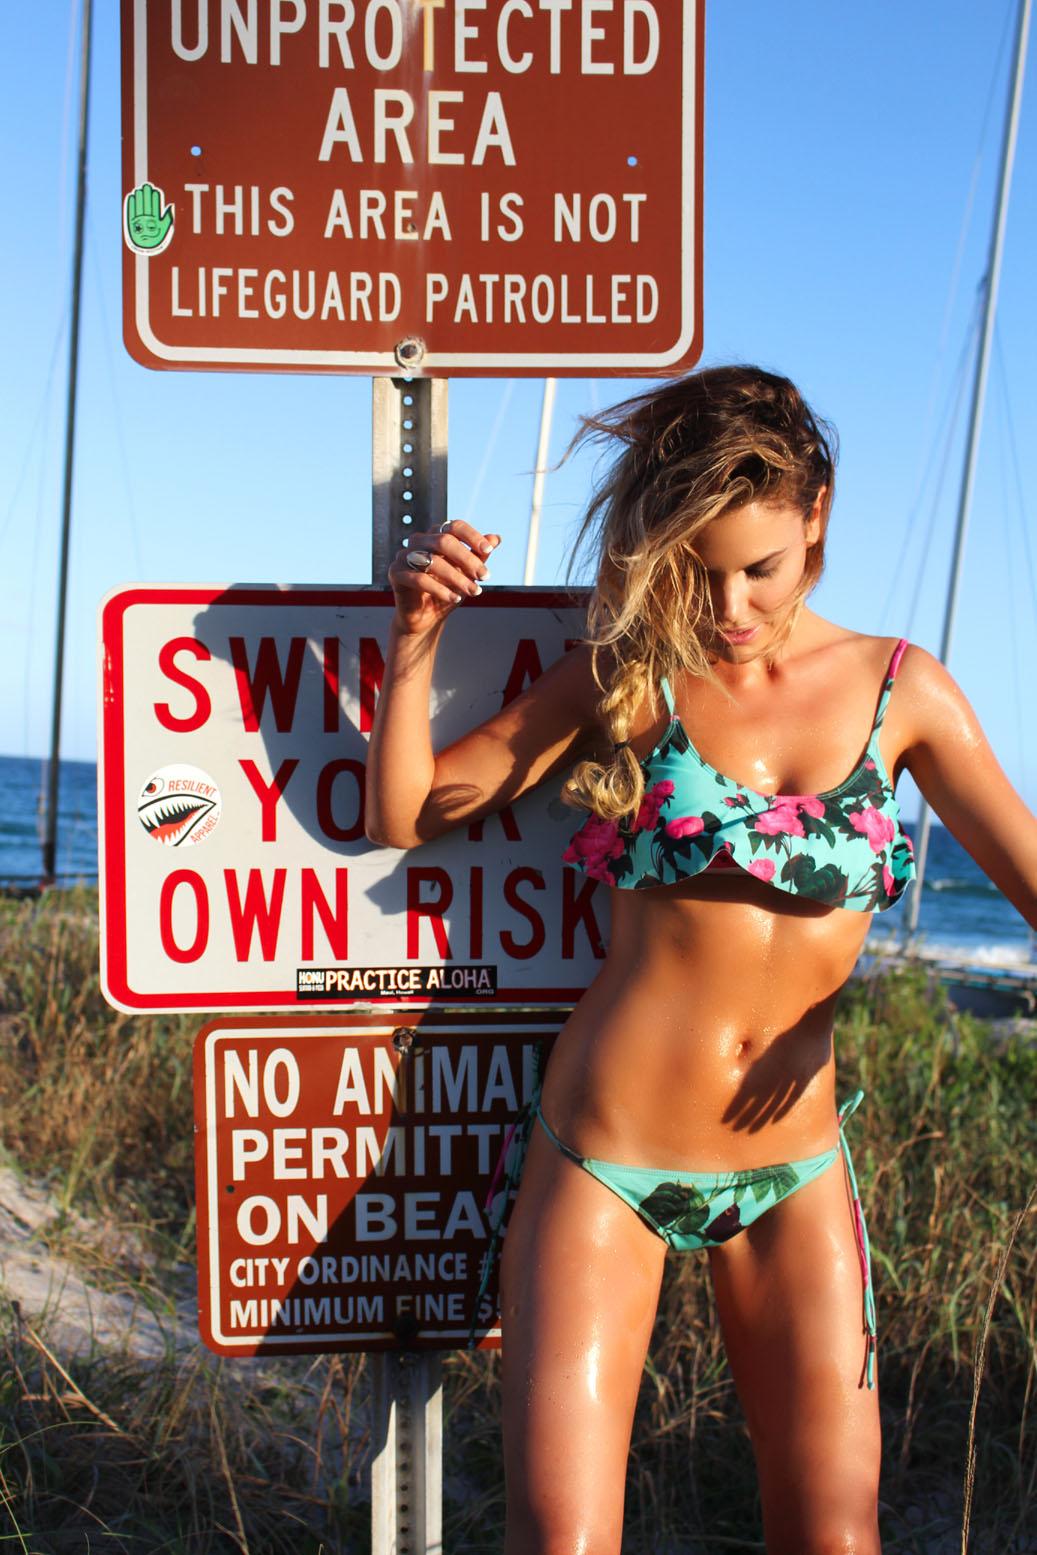 Rosalind Lipsett 2014 : Rosalind Lipsett Bikini Photos: Beach Riot Shoot -04